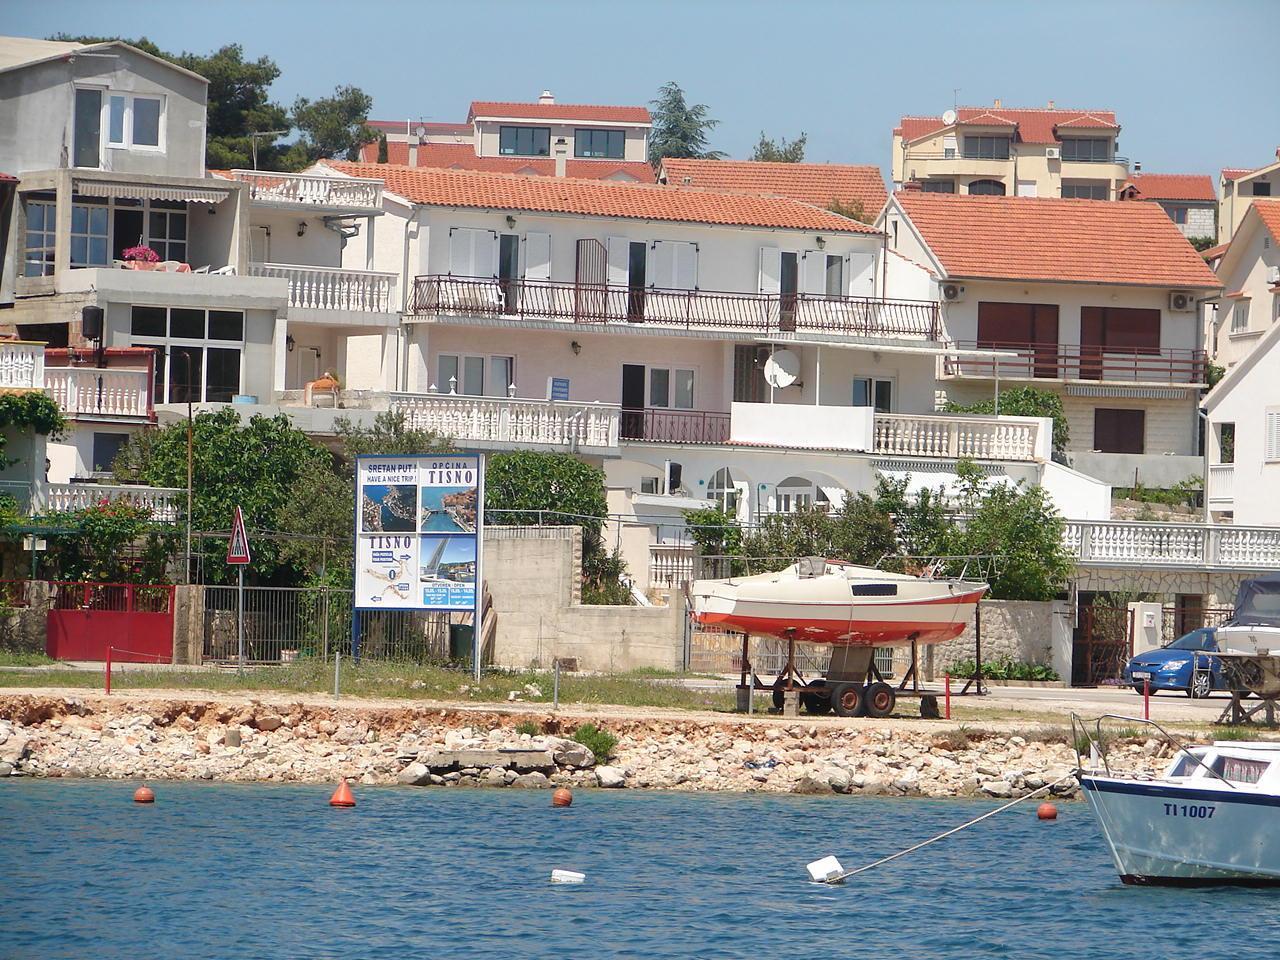 2526 - Tisno - Appartementen Kroatië